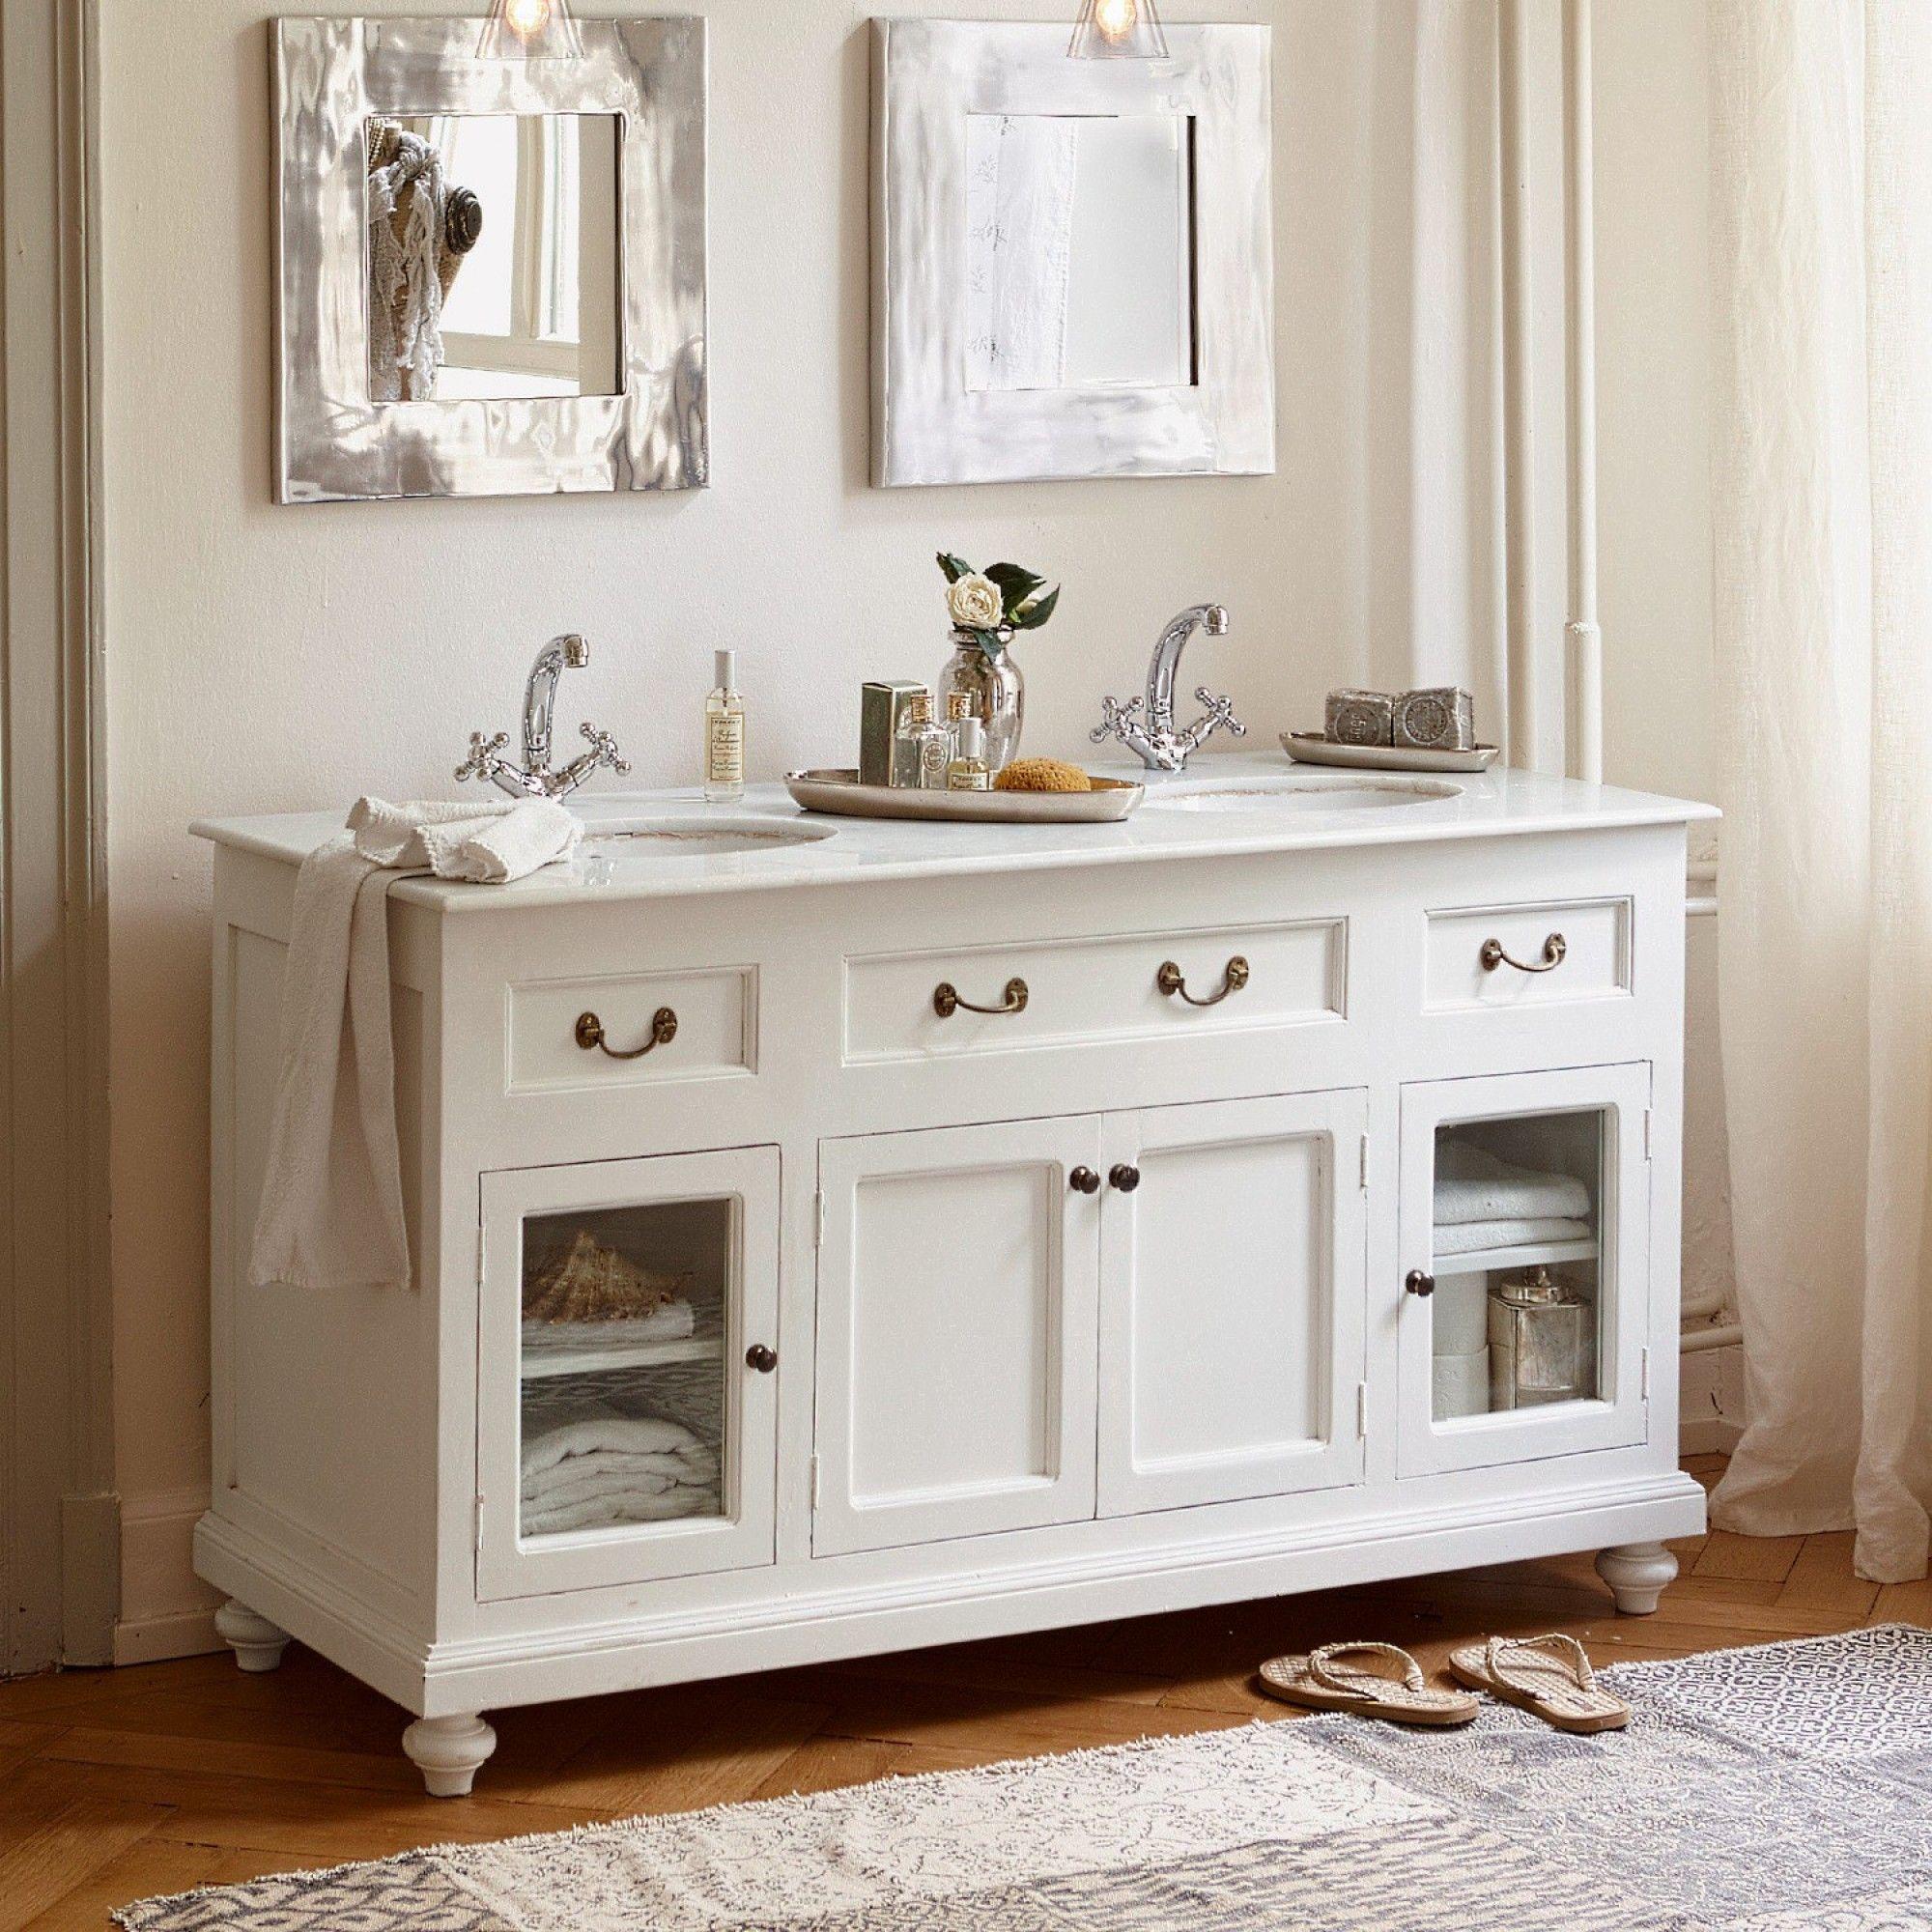 Http Www Google At Blank Html Shabby Chic Bathroom Bathroom Inspiration Bathroom Vanity